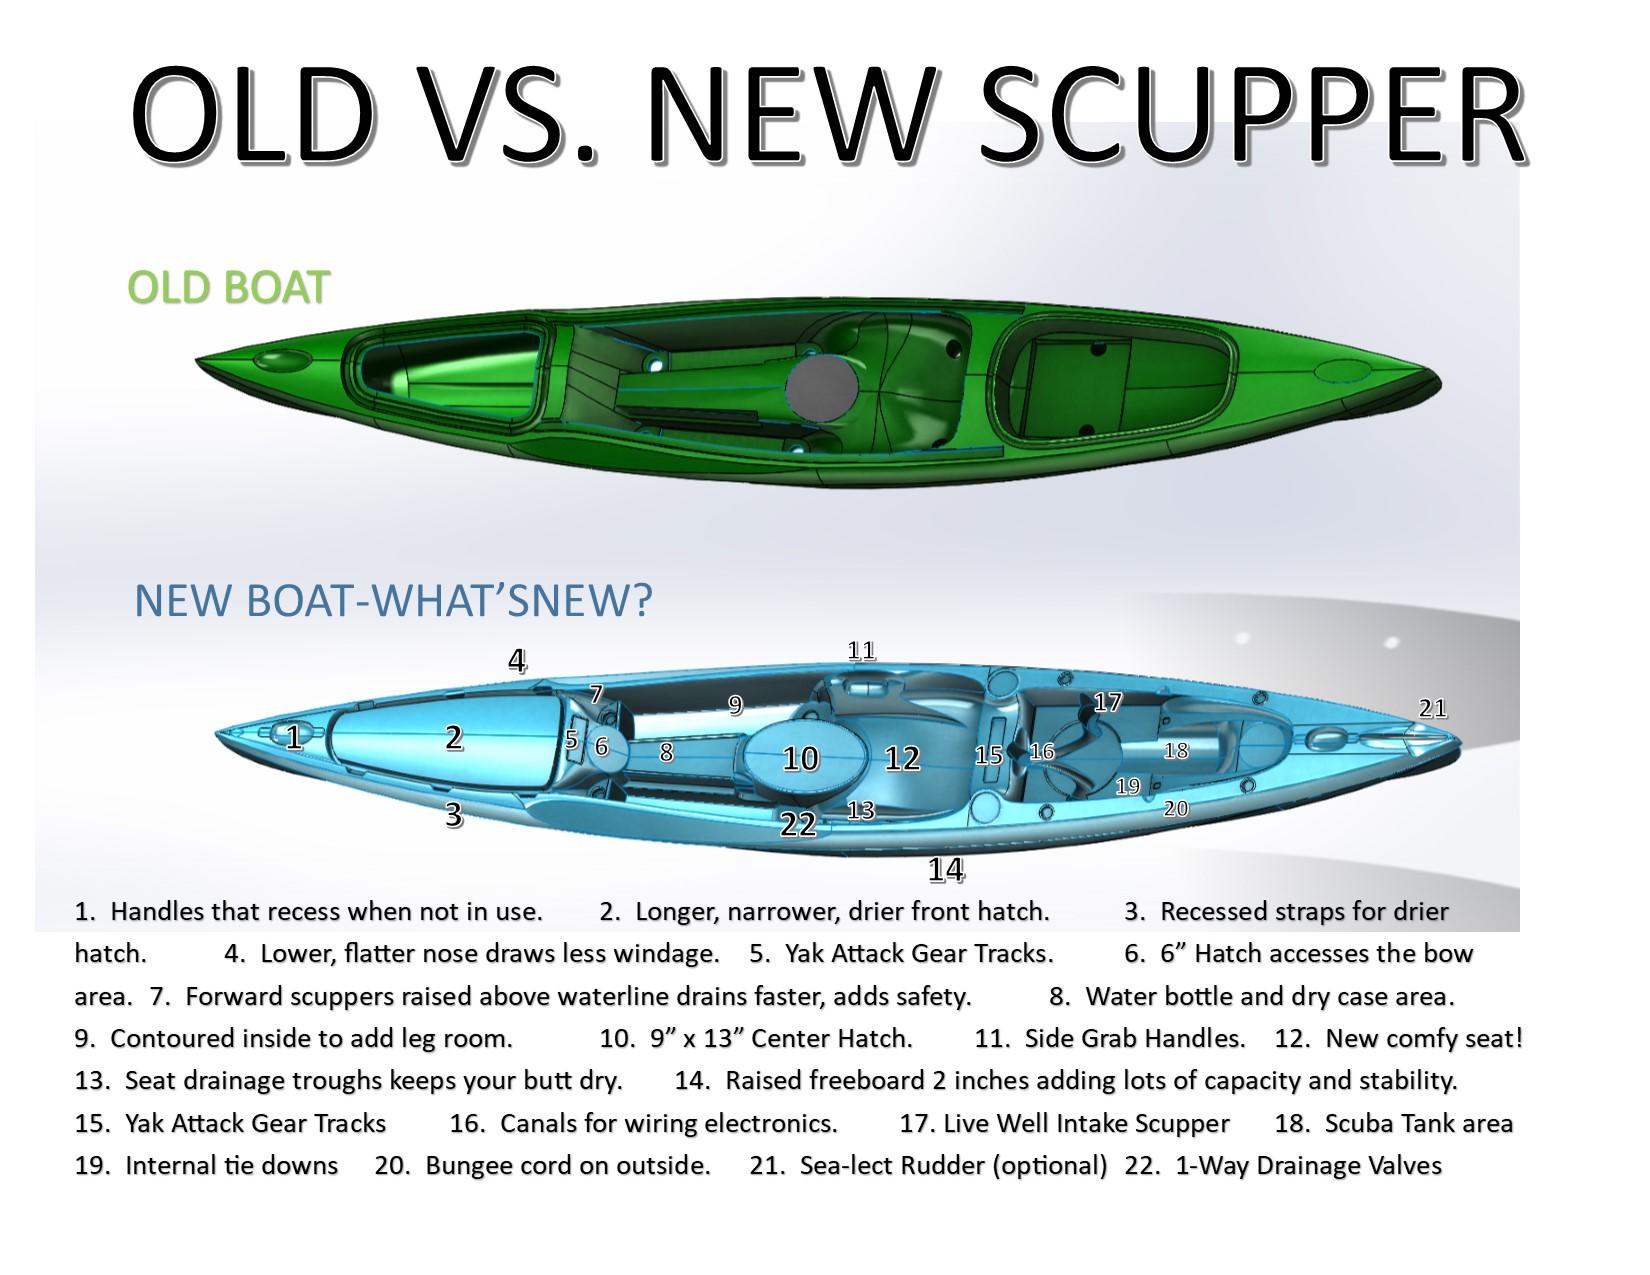 sCUPPER old vs new.jpg